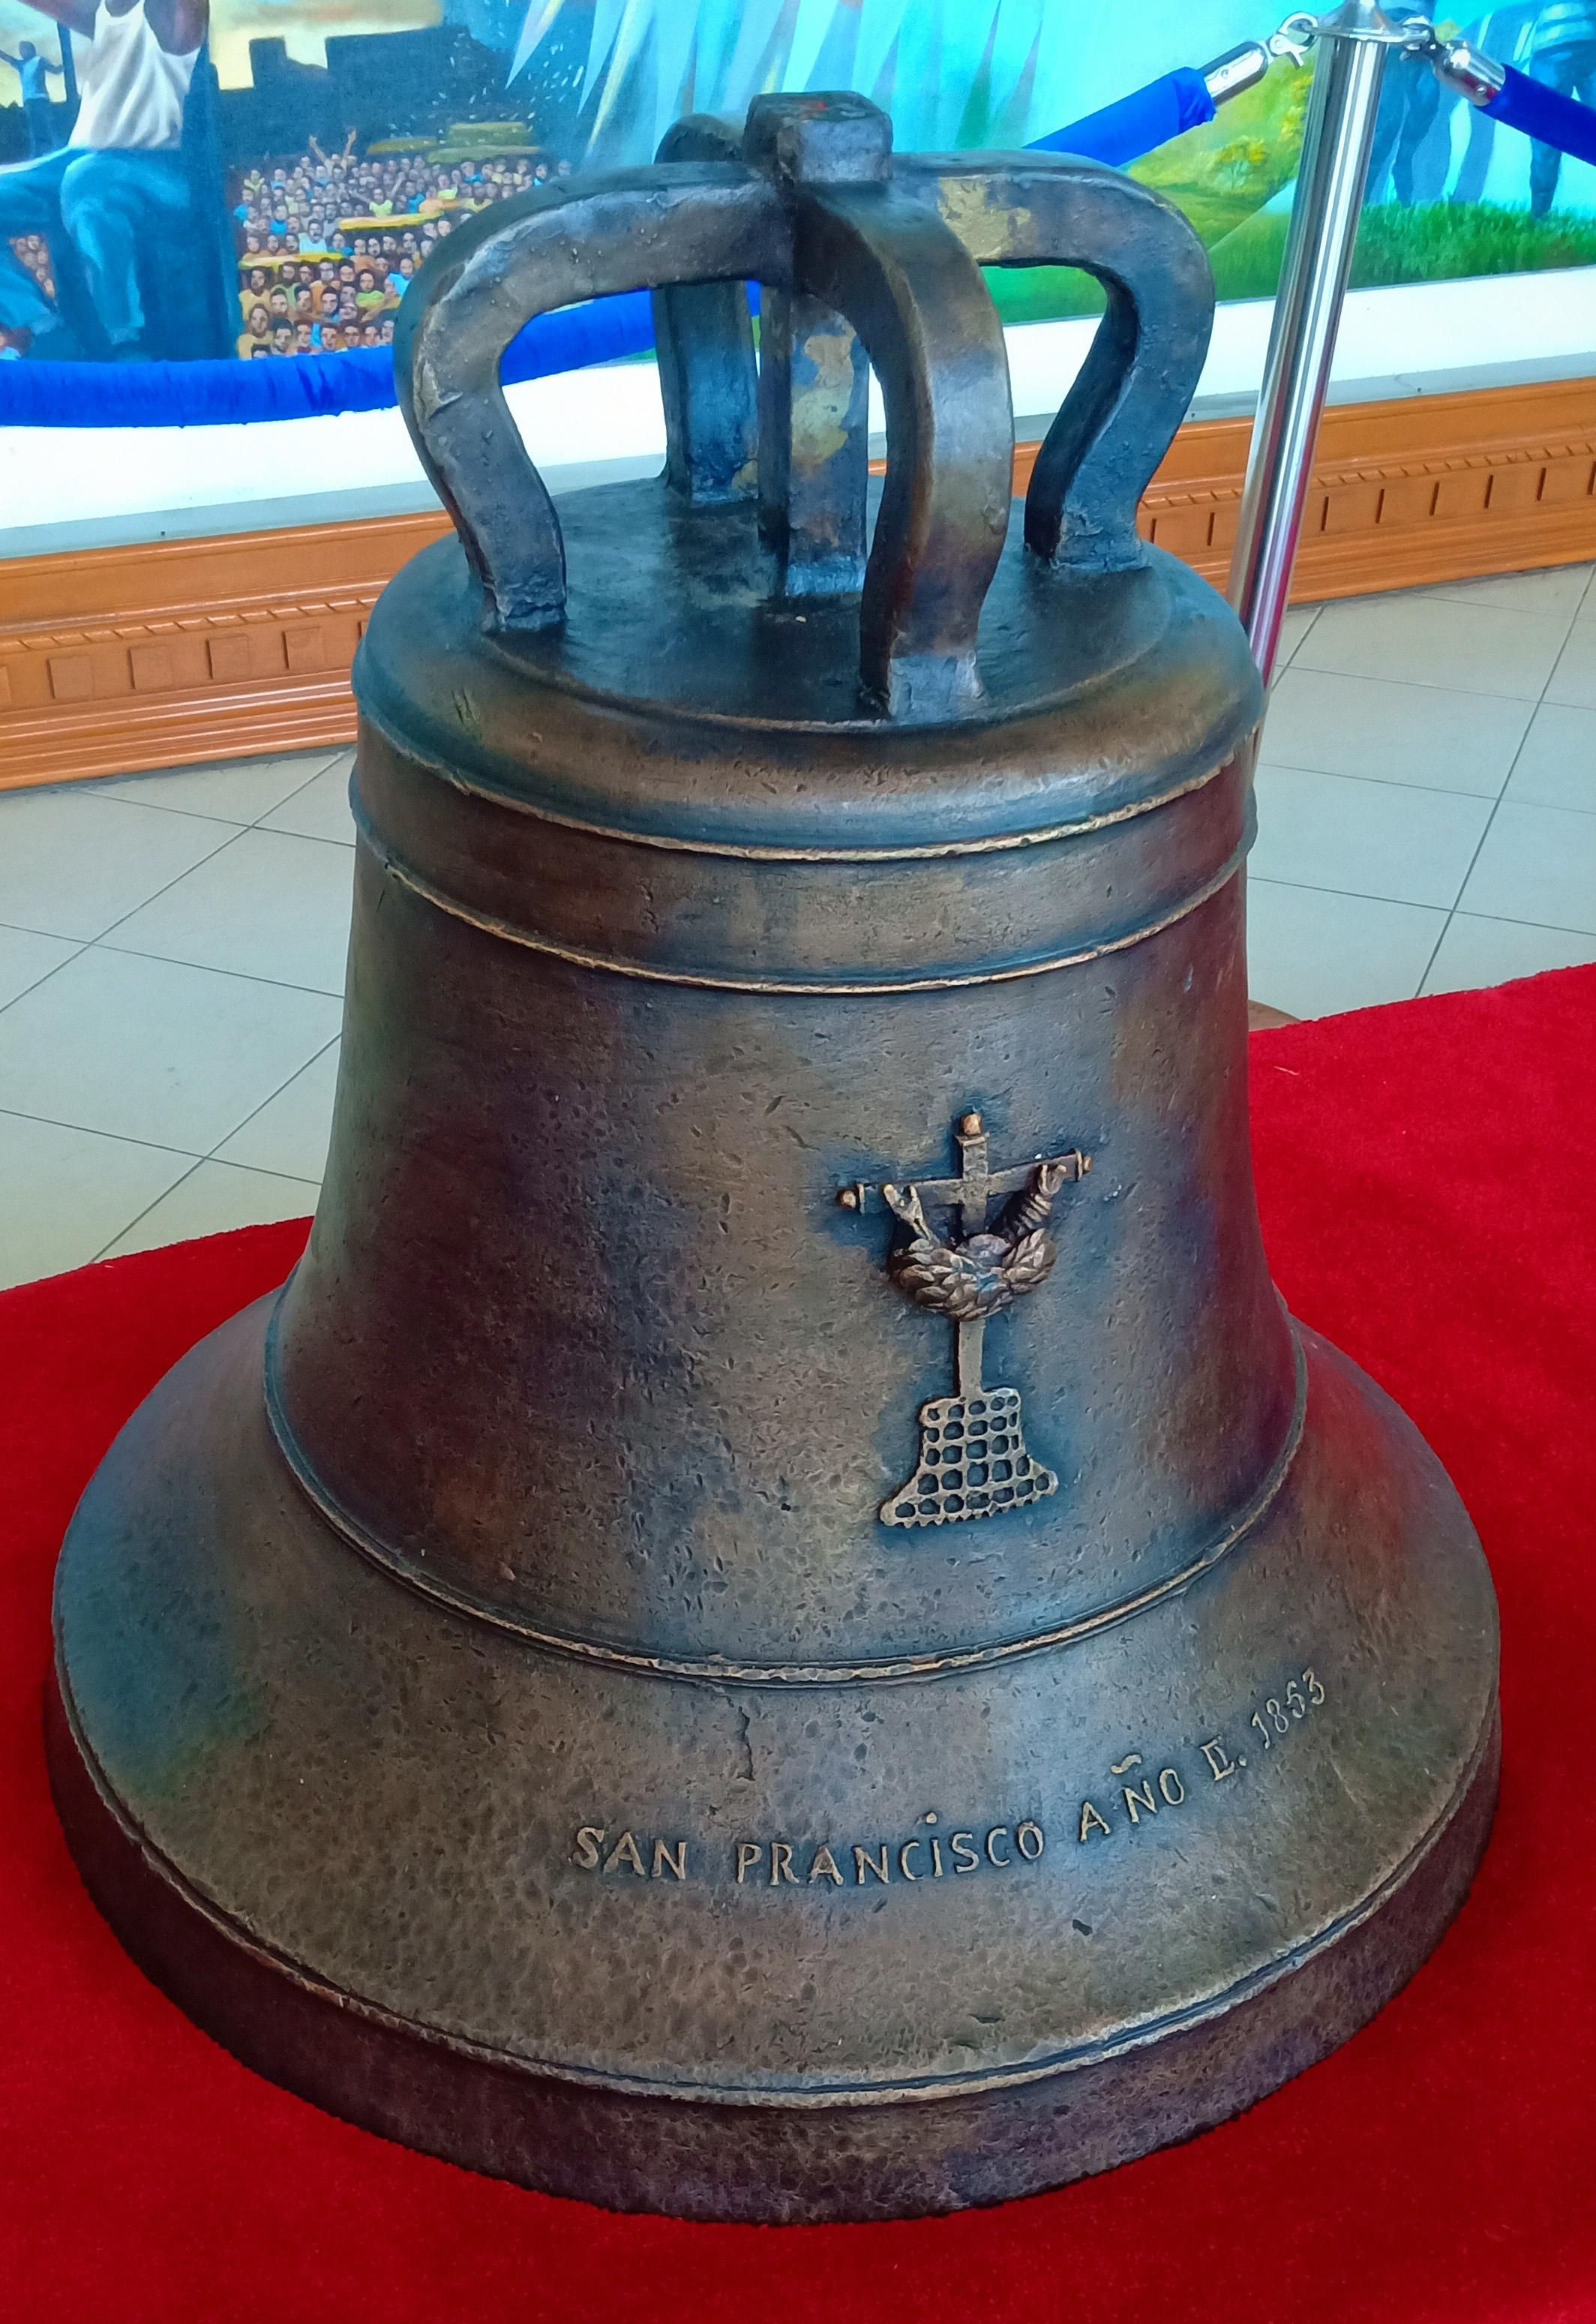 Balangiga bells - Wikipedia